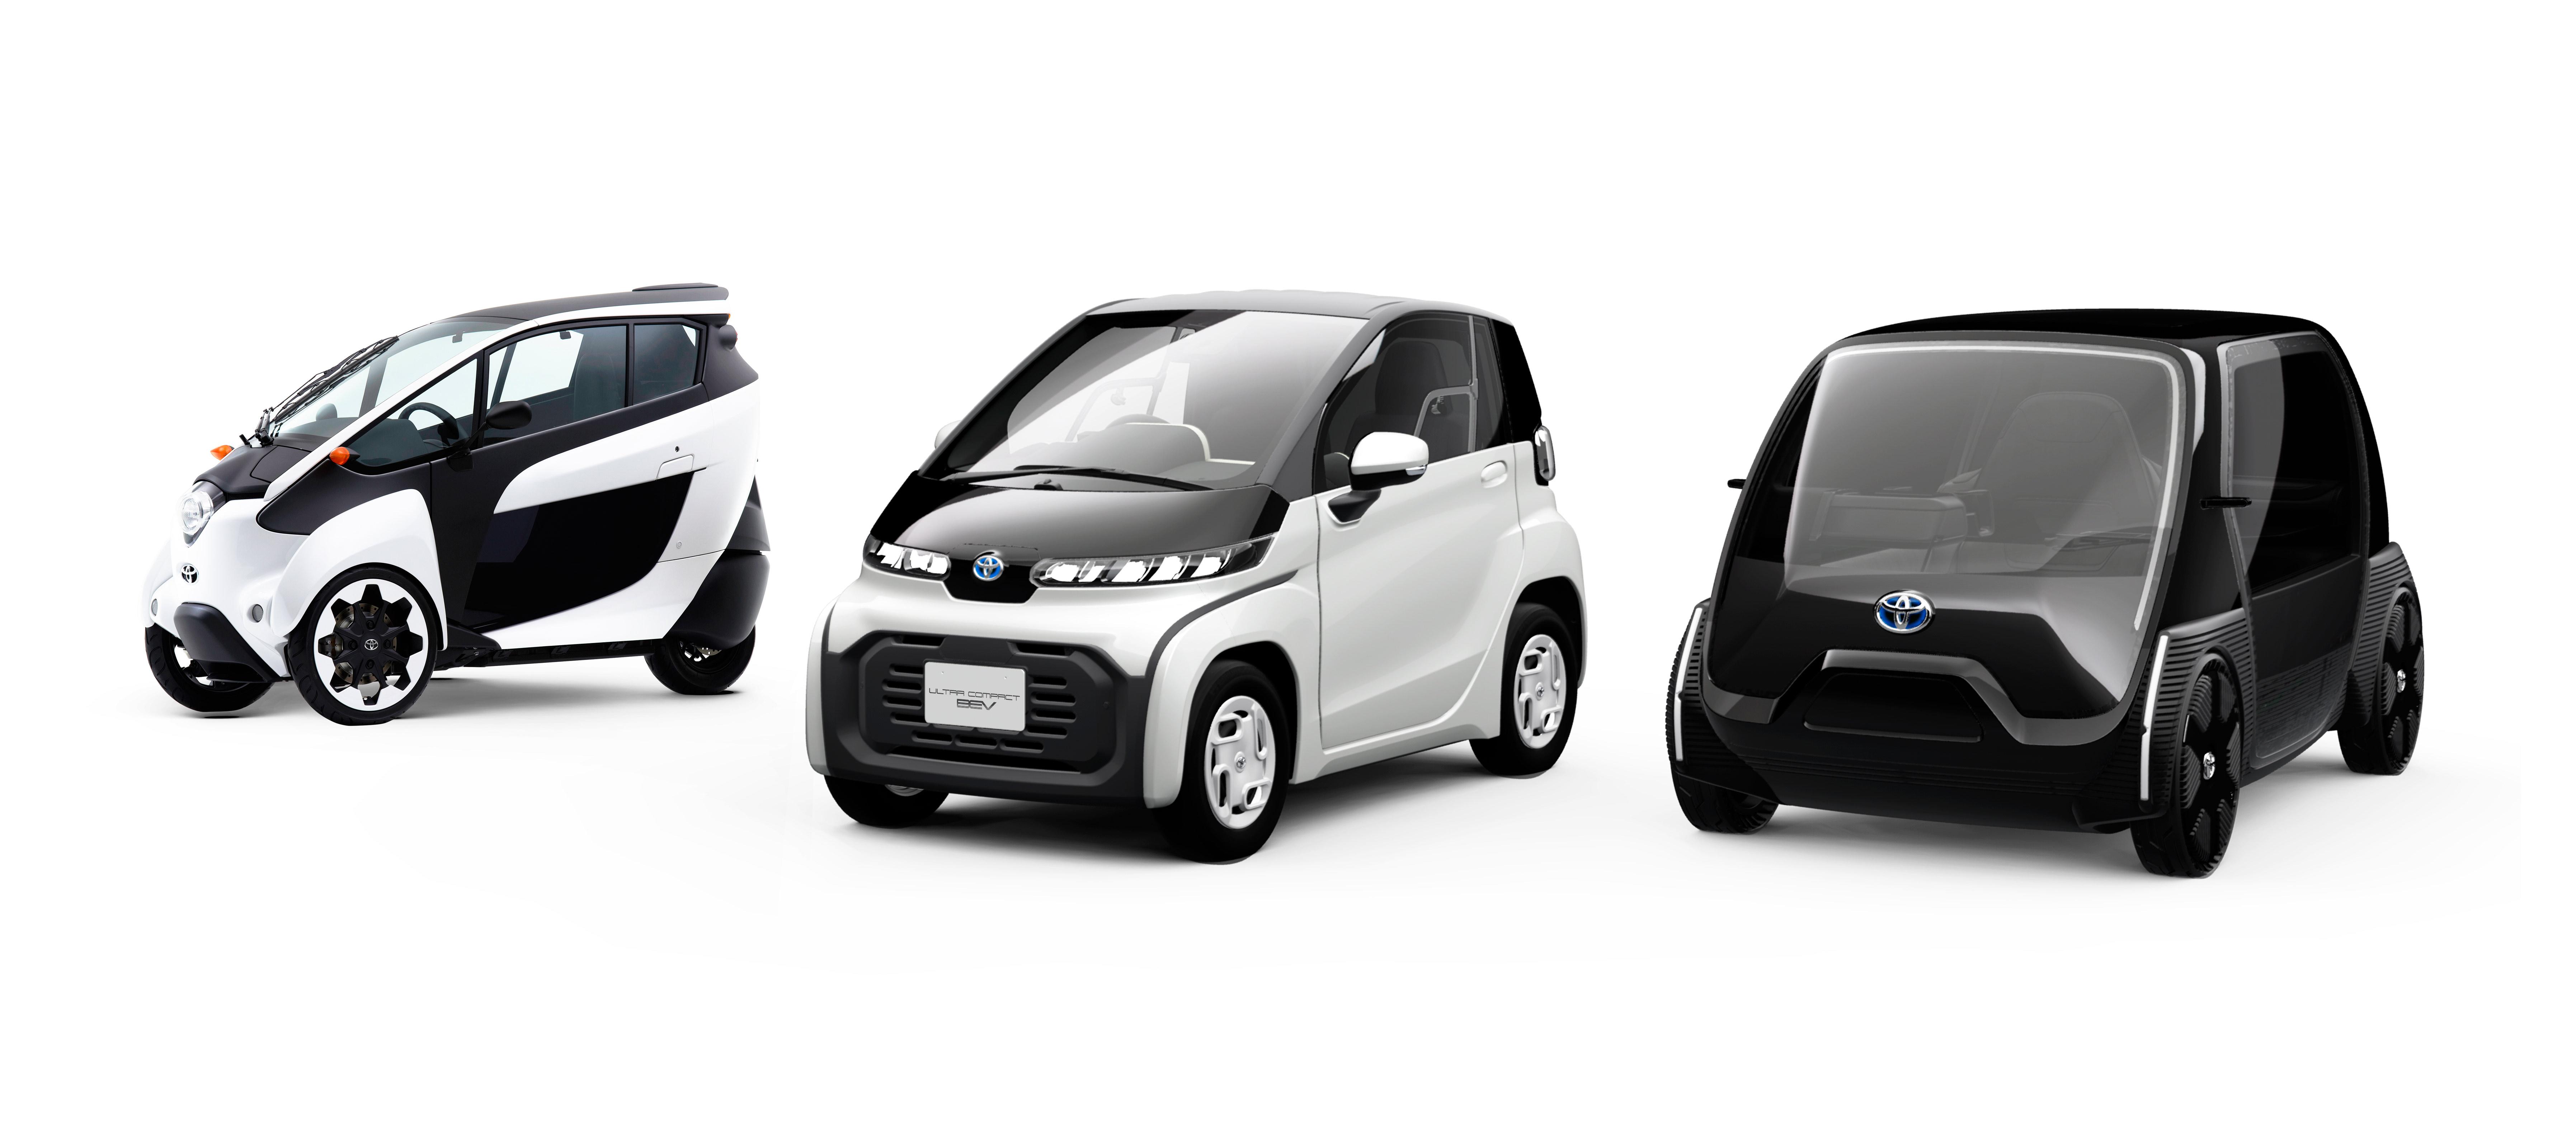 Toyota ha presentado Ultra-compact